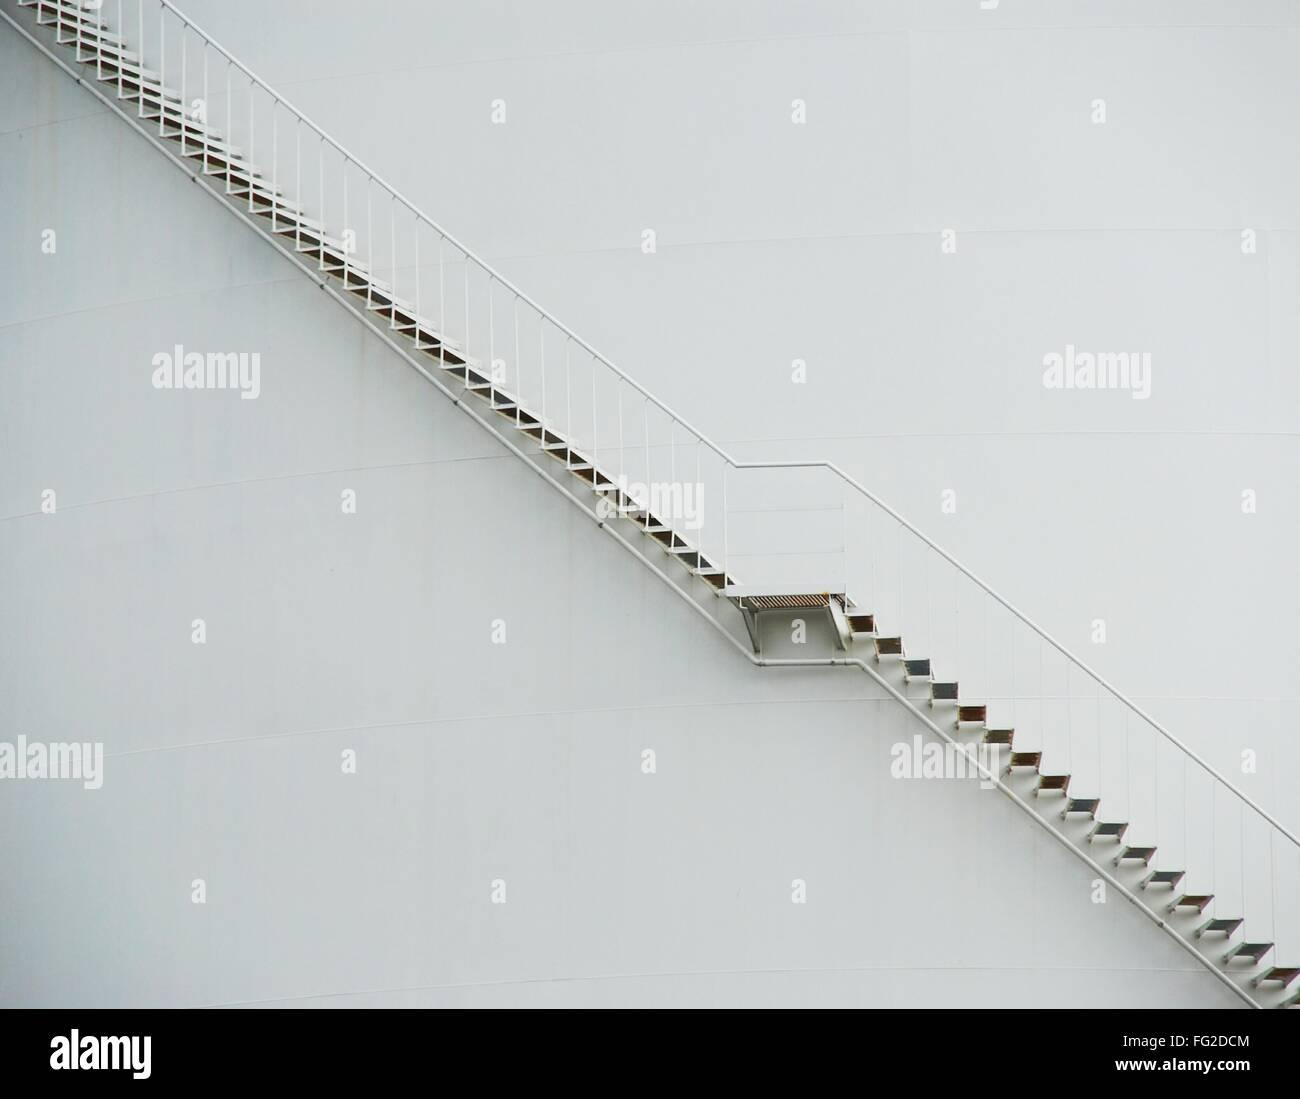 Vista lateral de la escalera contra la pared Imagen De Stock